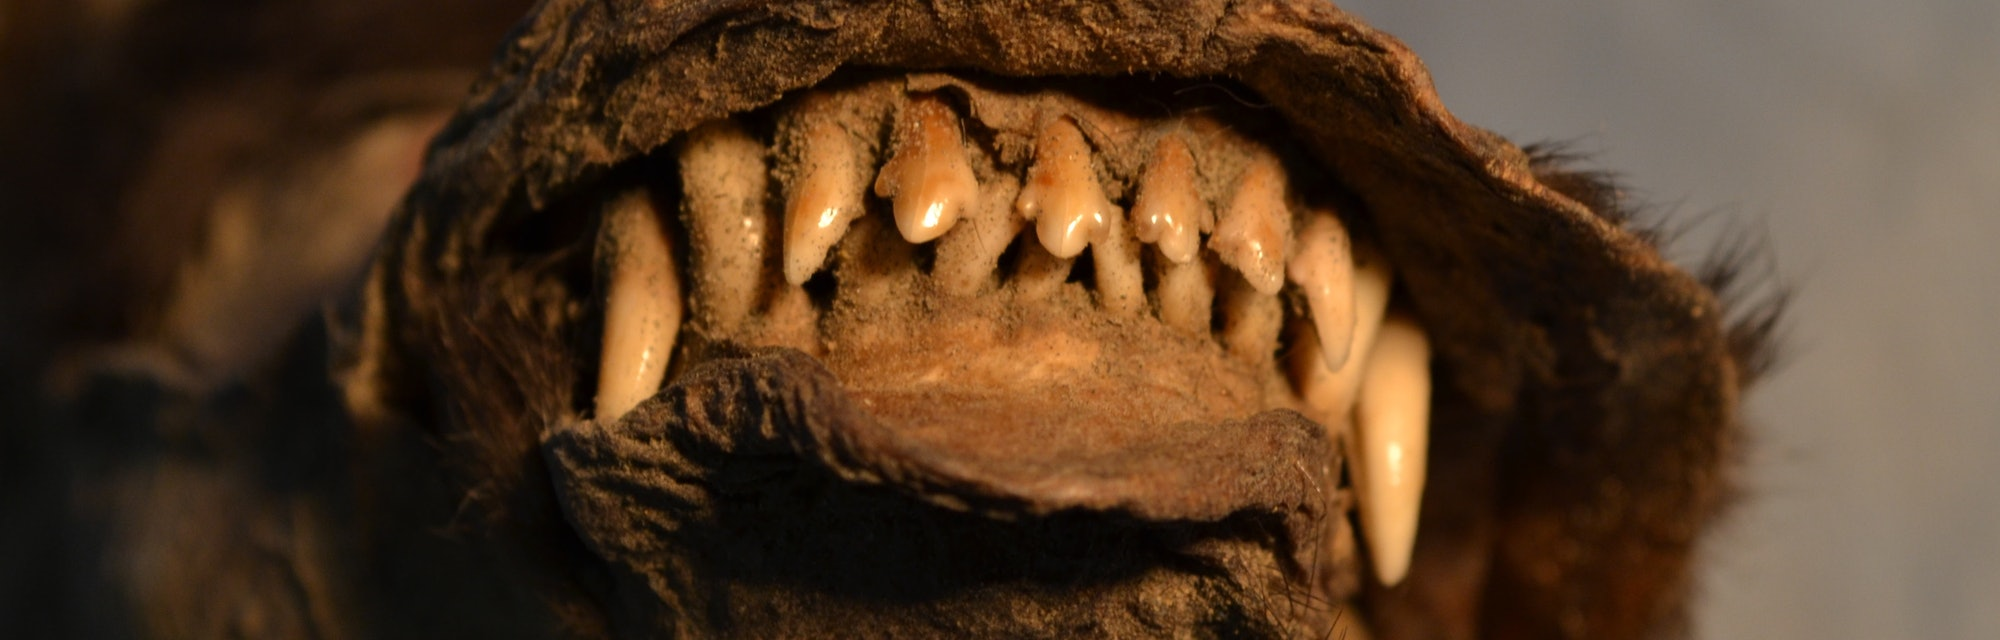 mummified puppy teeth bared